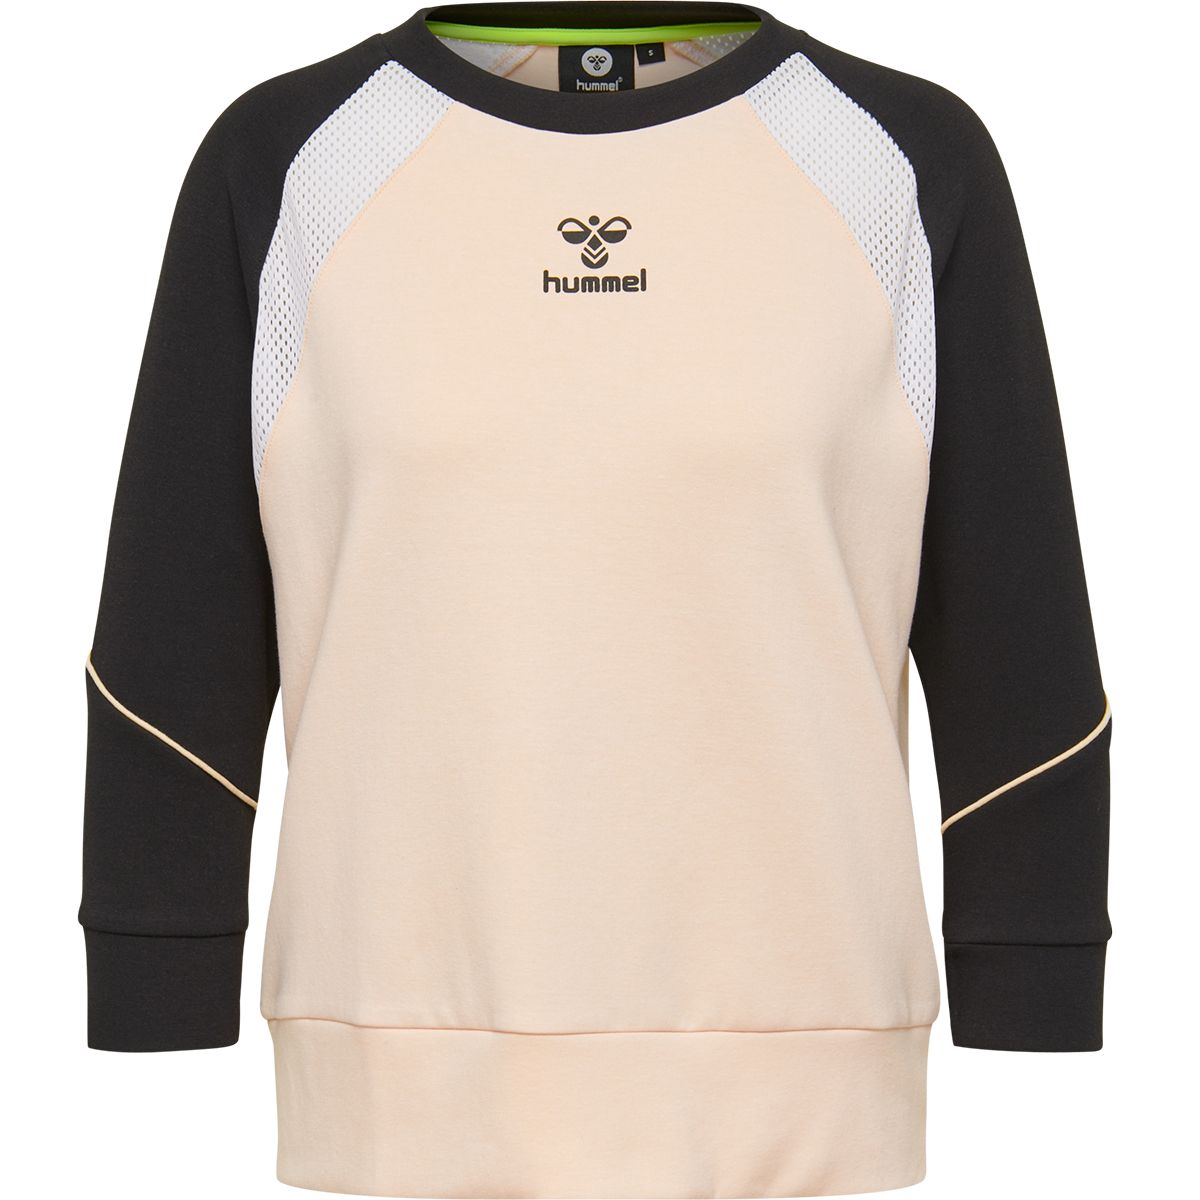 Hummel Nirvana sweatshirt, cloud pink, x-small